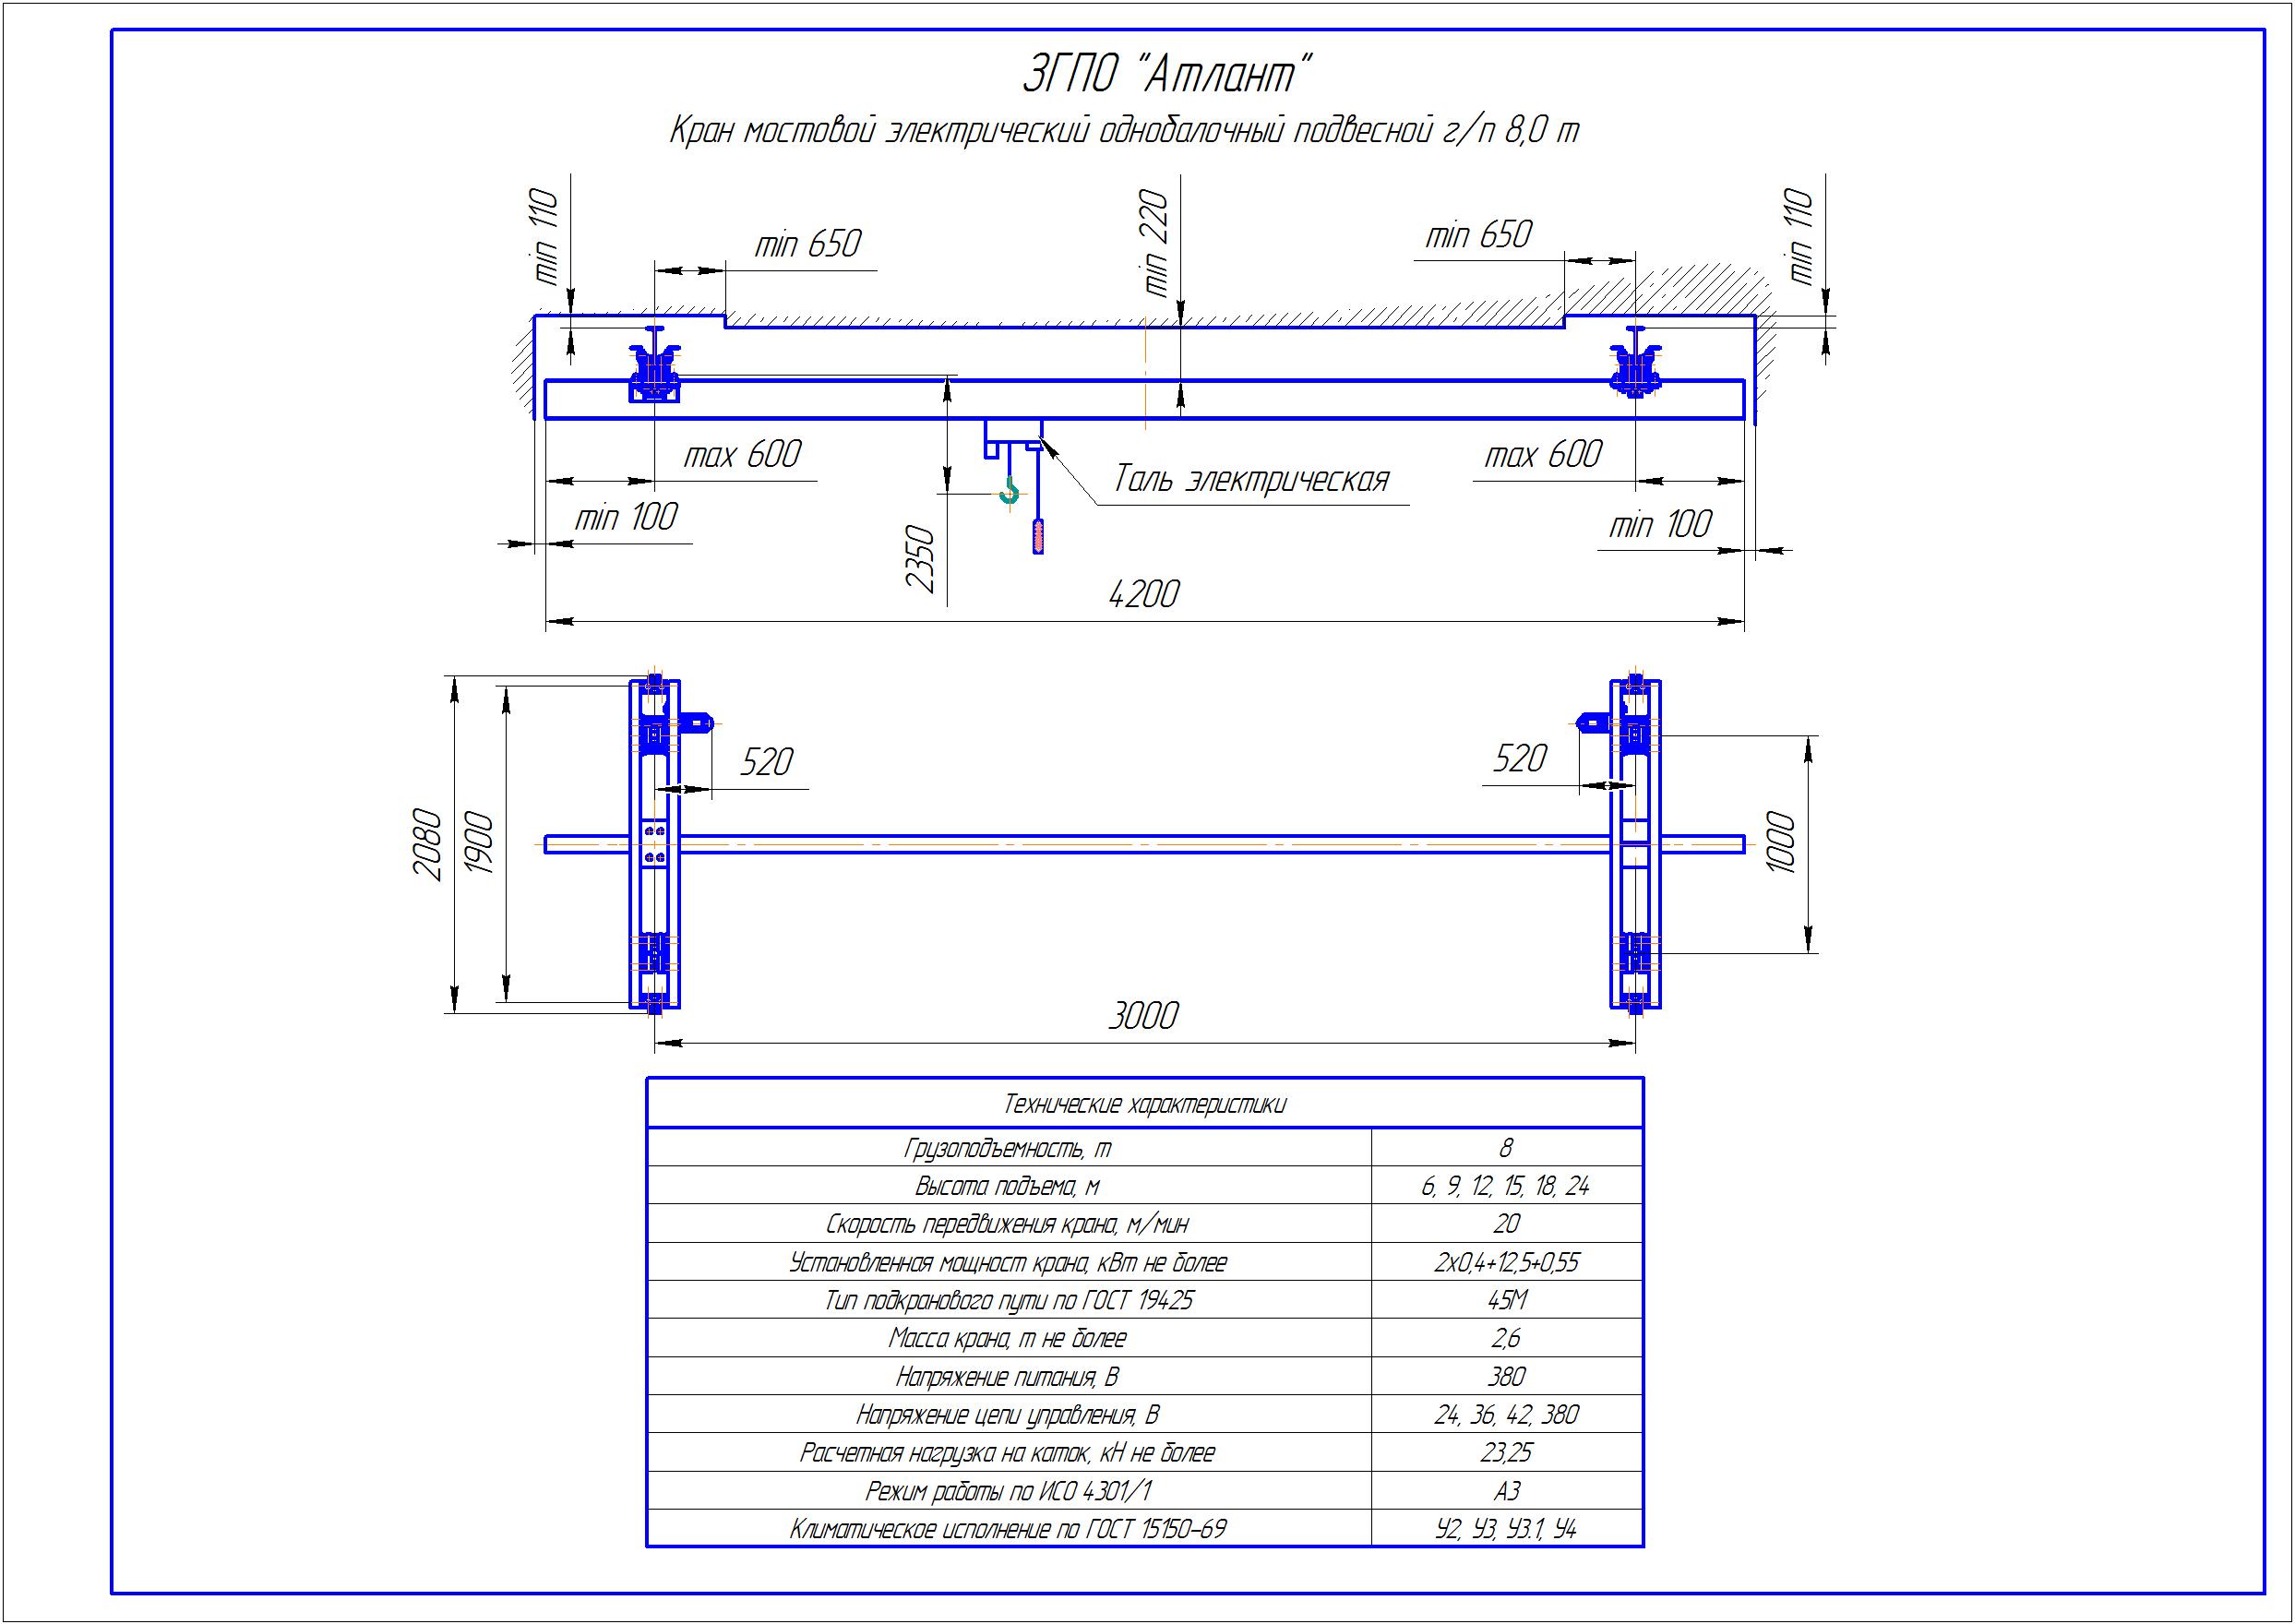 KBP 6 1 - Подвесная кран балка